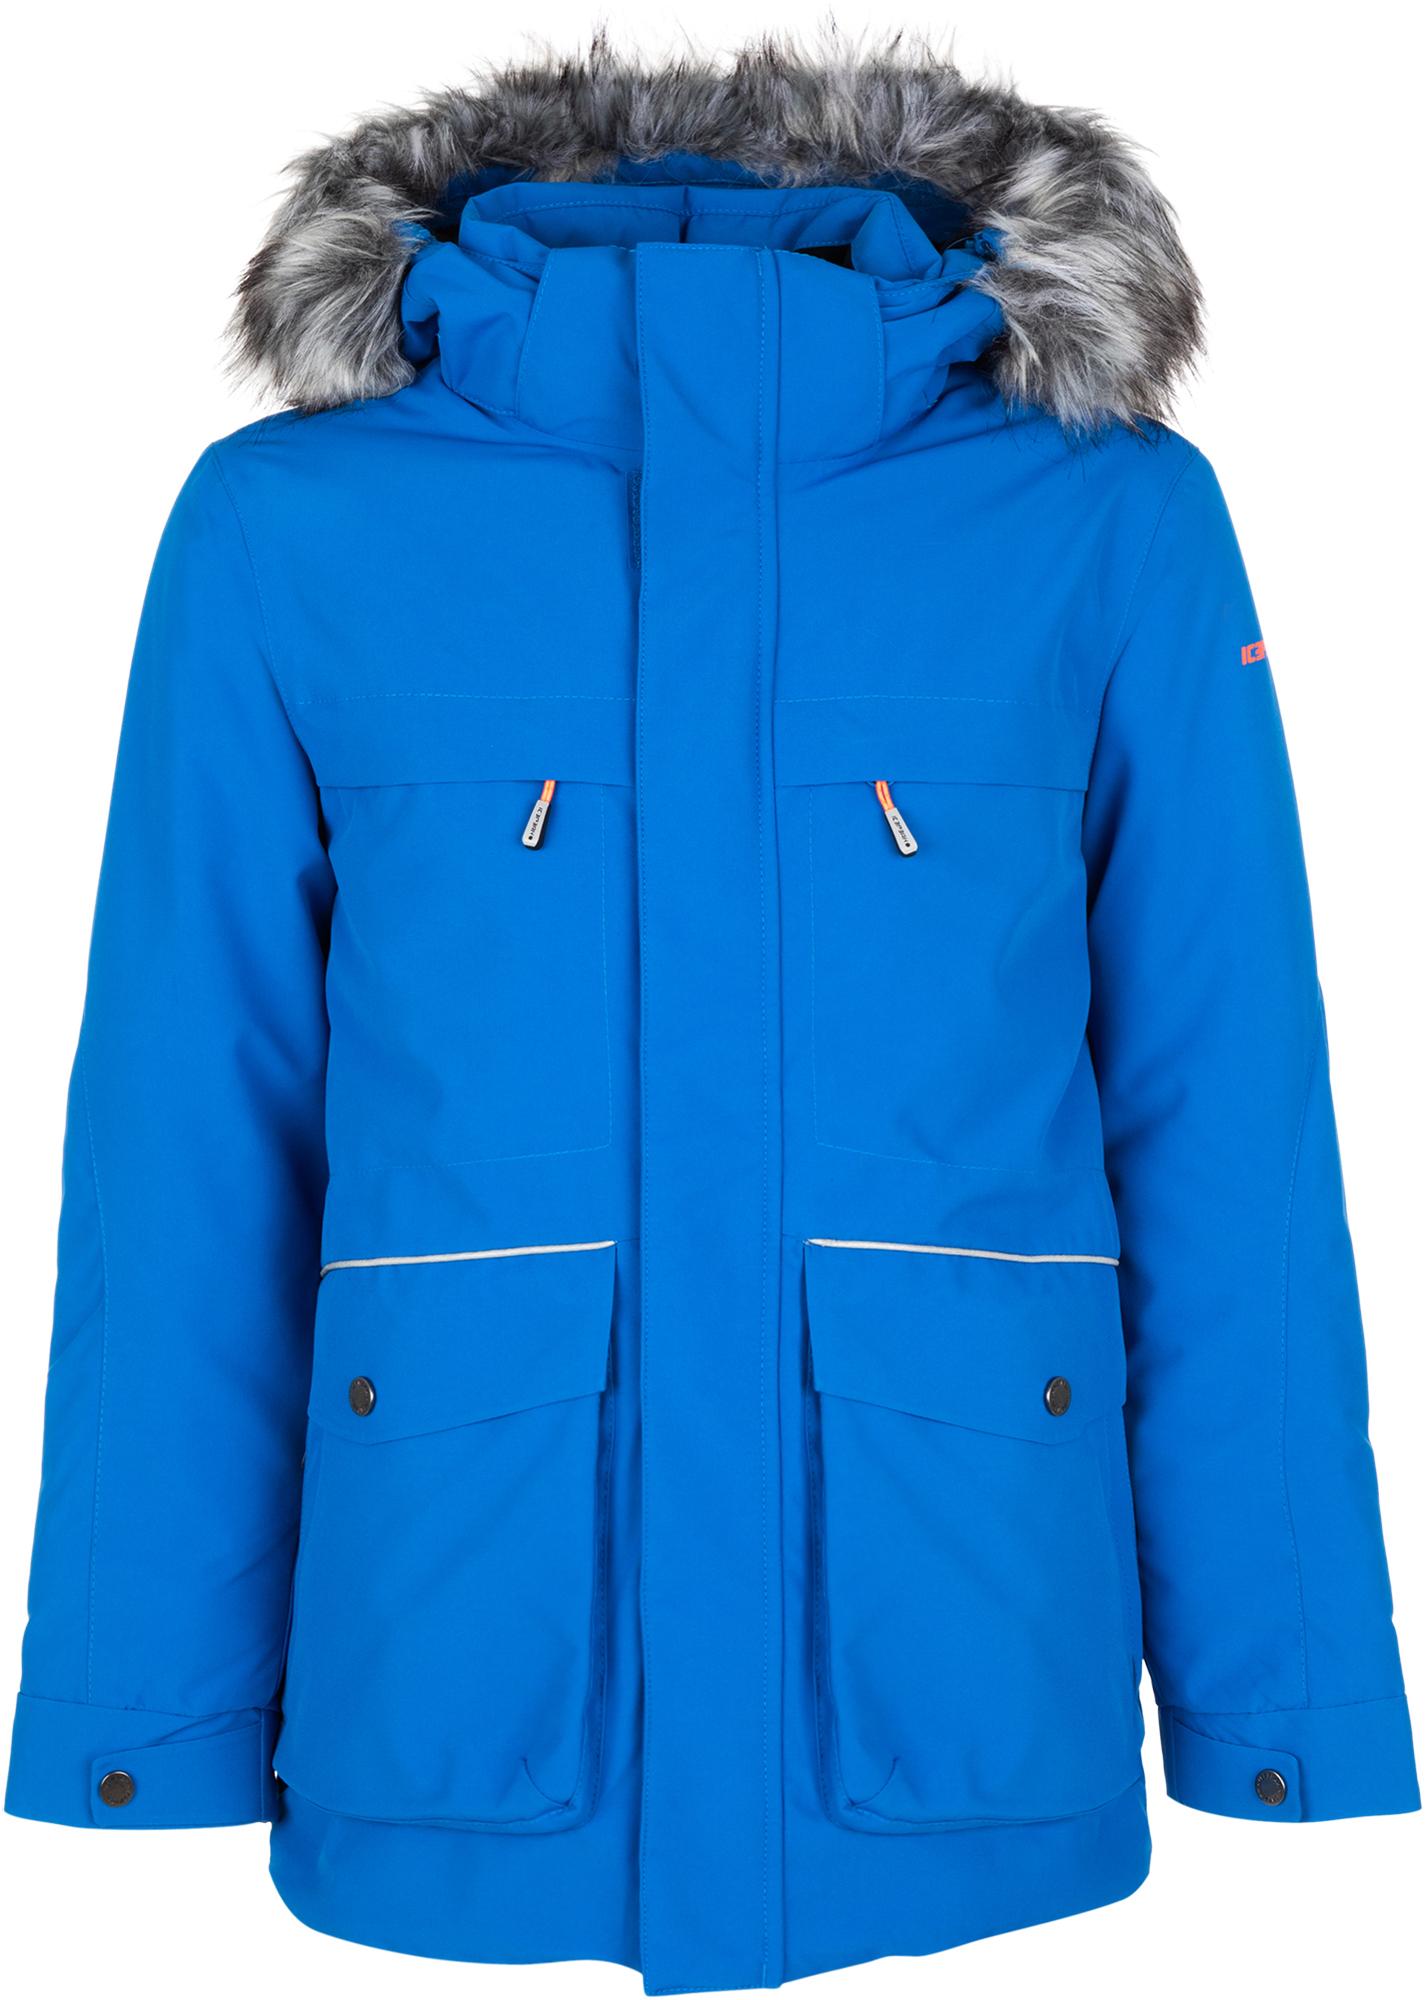 IcePeak Куртка утепленная для мальчиков Keo JR, размер 176